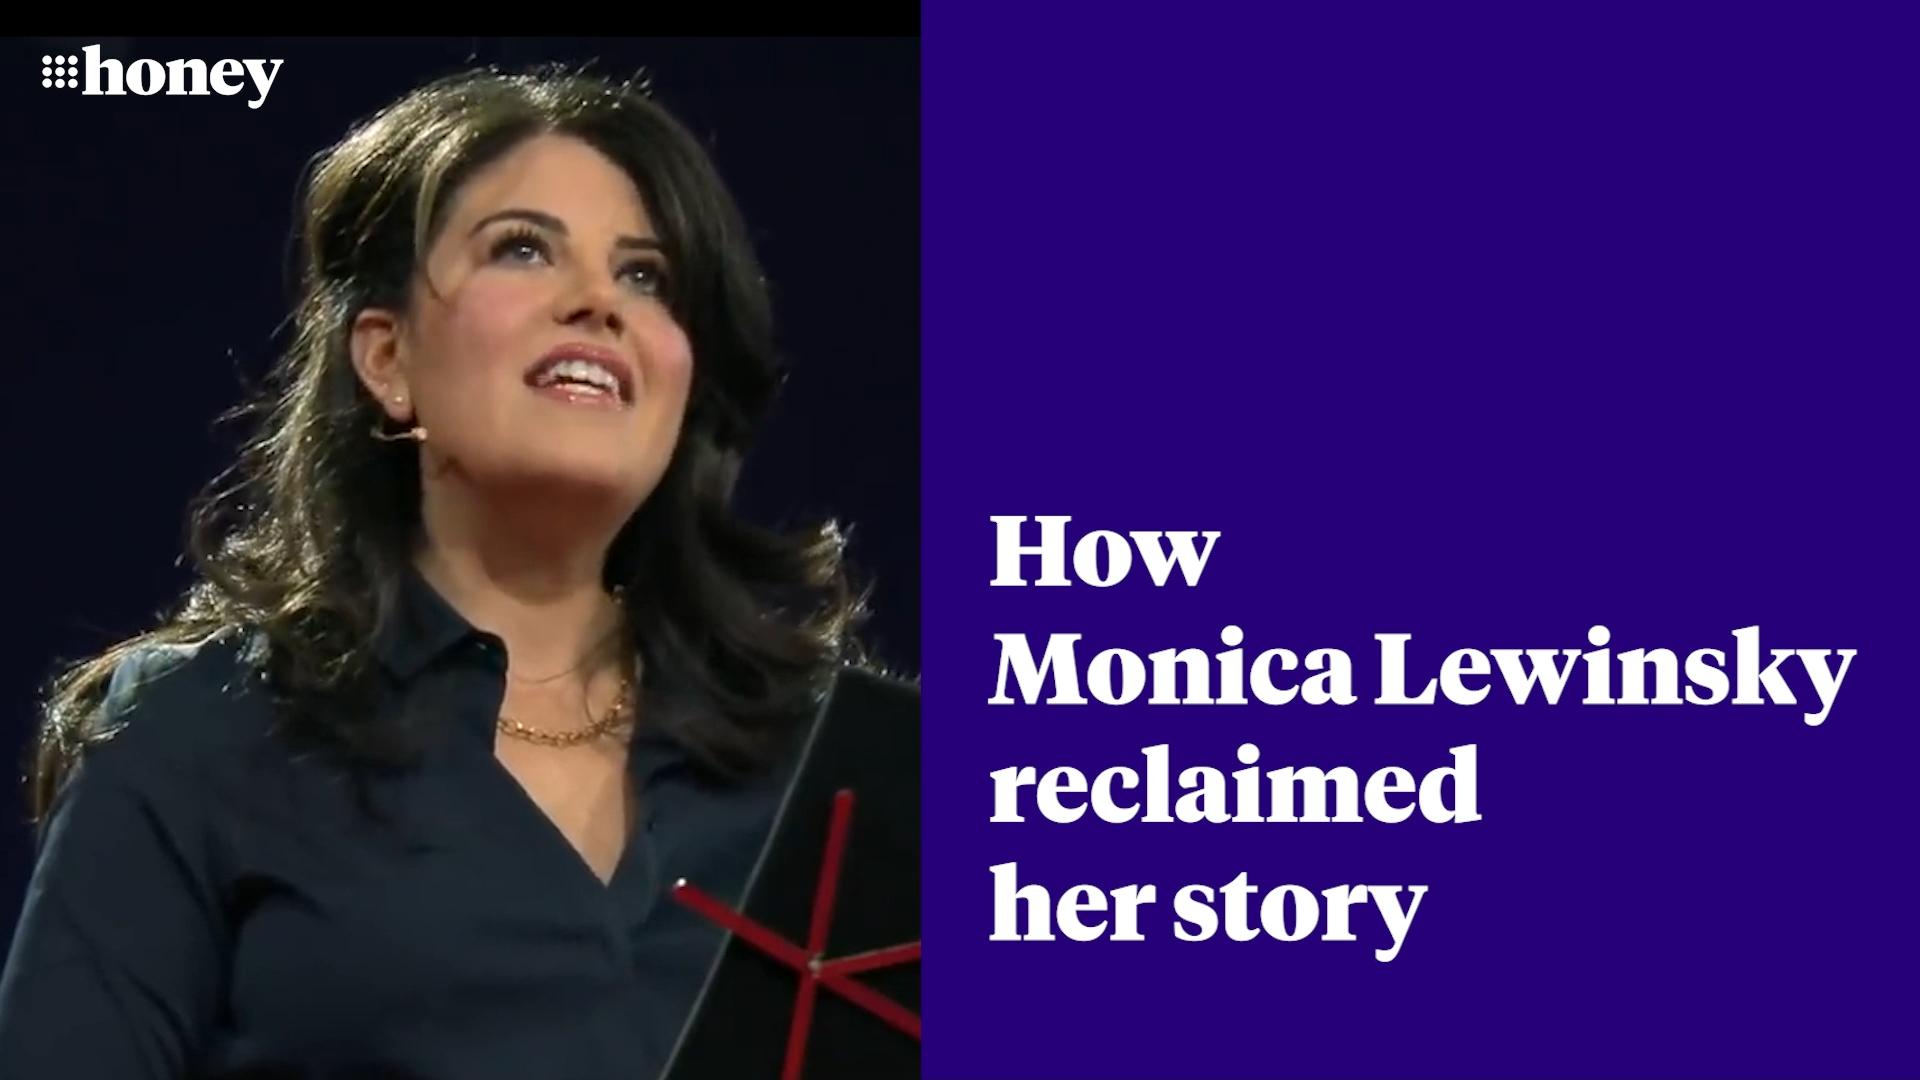 How Monica Lewinsky reclaimed her story